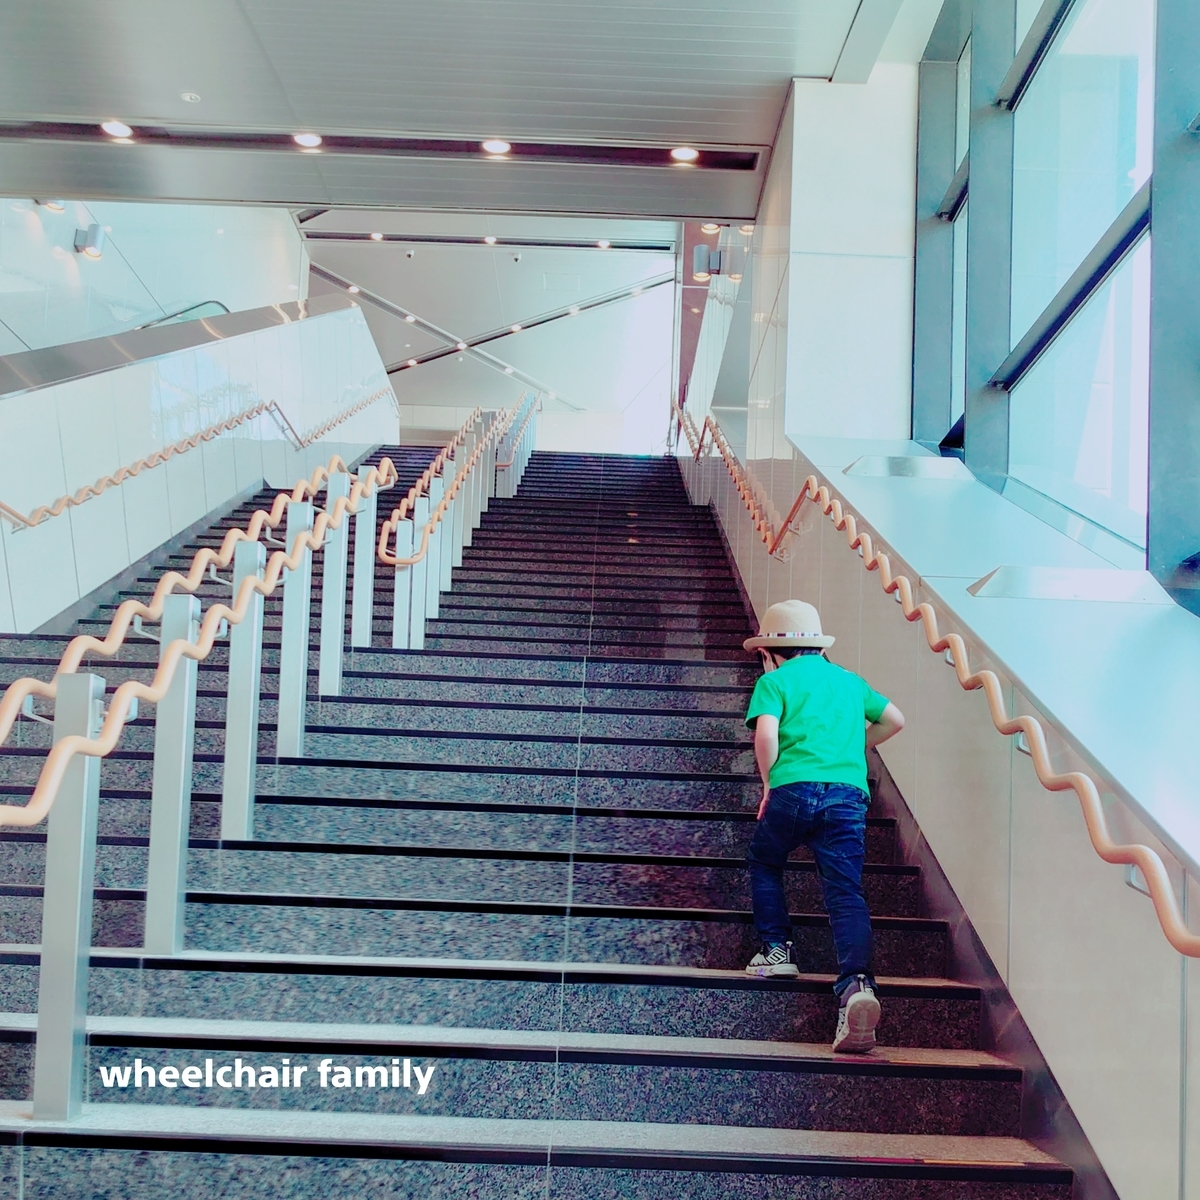 f:id:WheelchairFamily:20200625101941j:plain